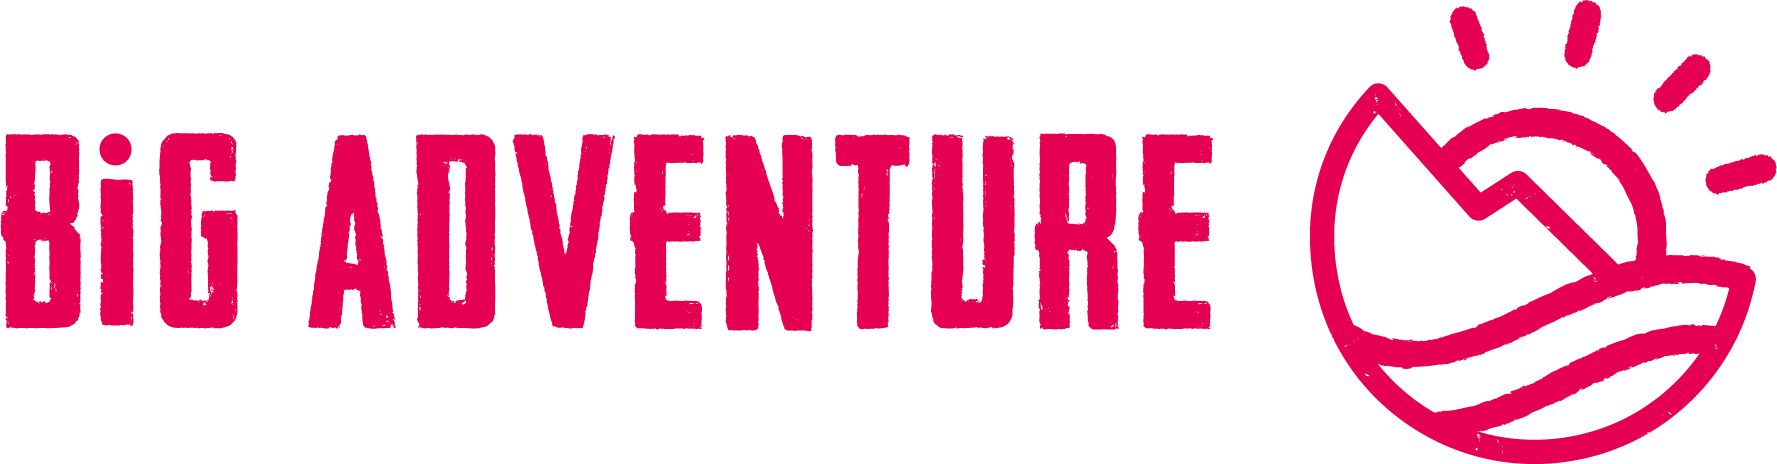 Big Adventure -